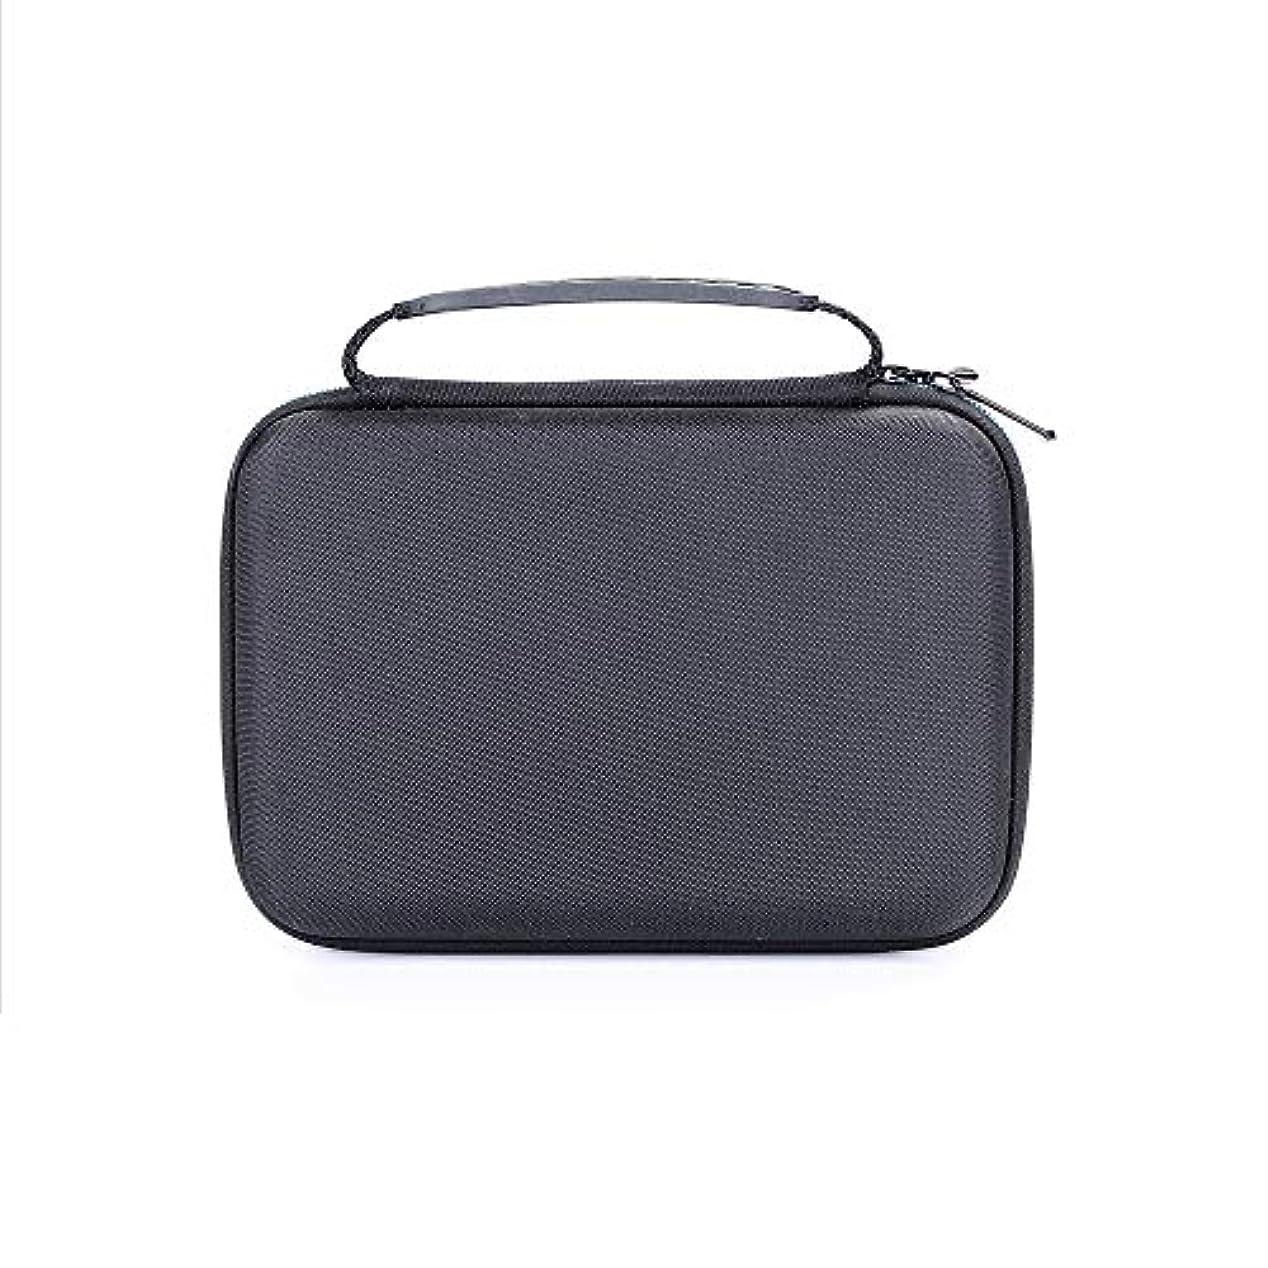 Gaoominy ポータブルの旅行用Evaハード携帯用ケース、ボックス、バッグ、 Norelco Multi Groom シリーズ 3000 Mg3750用